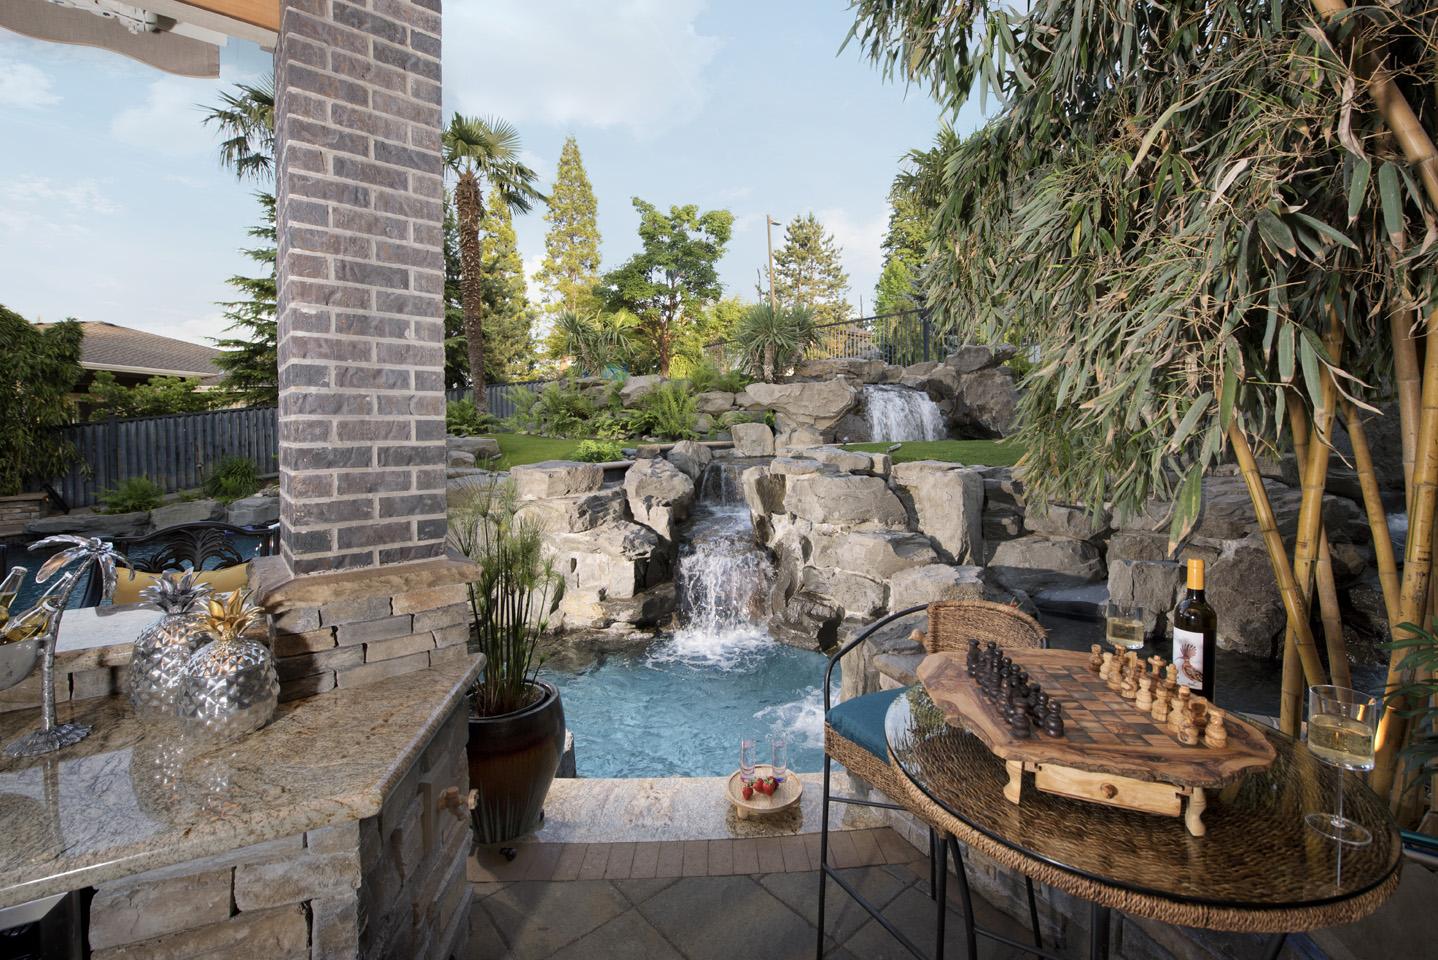 Tropical Outdoor Kitchen in Landscape Design